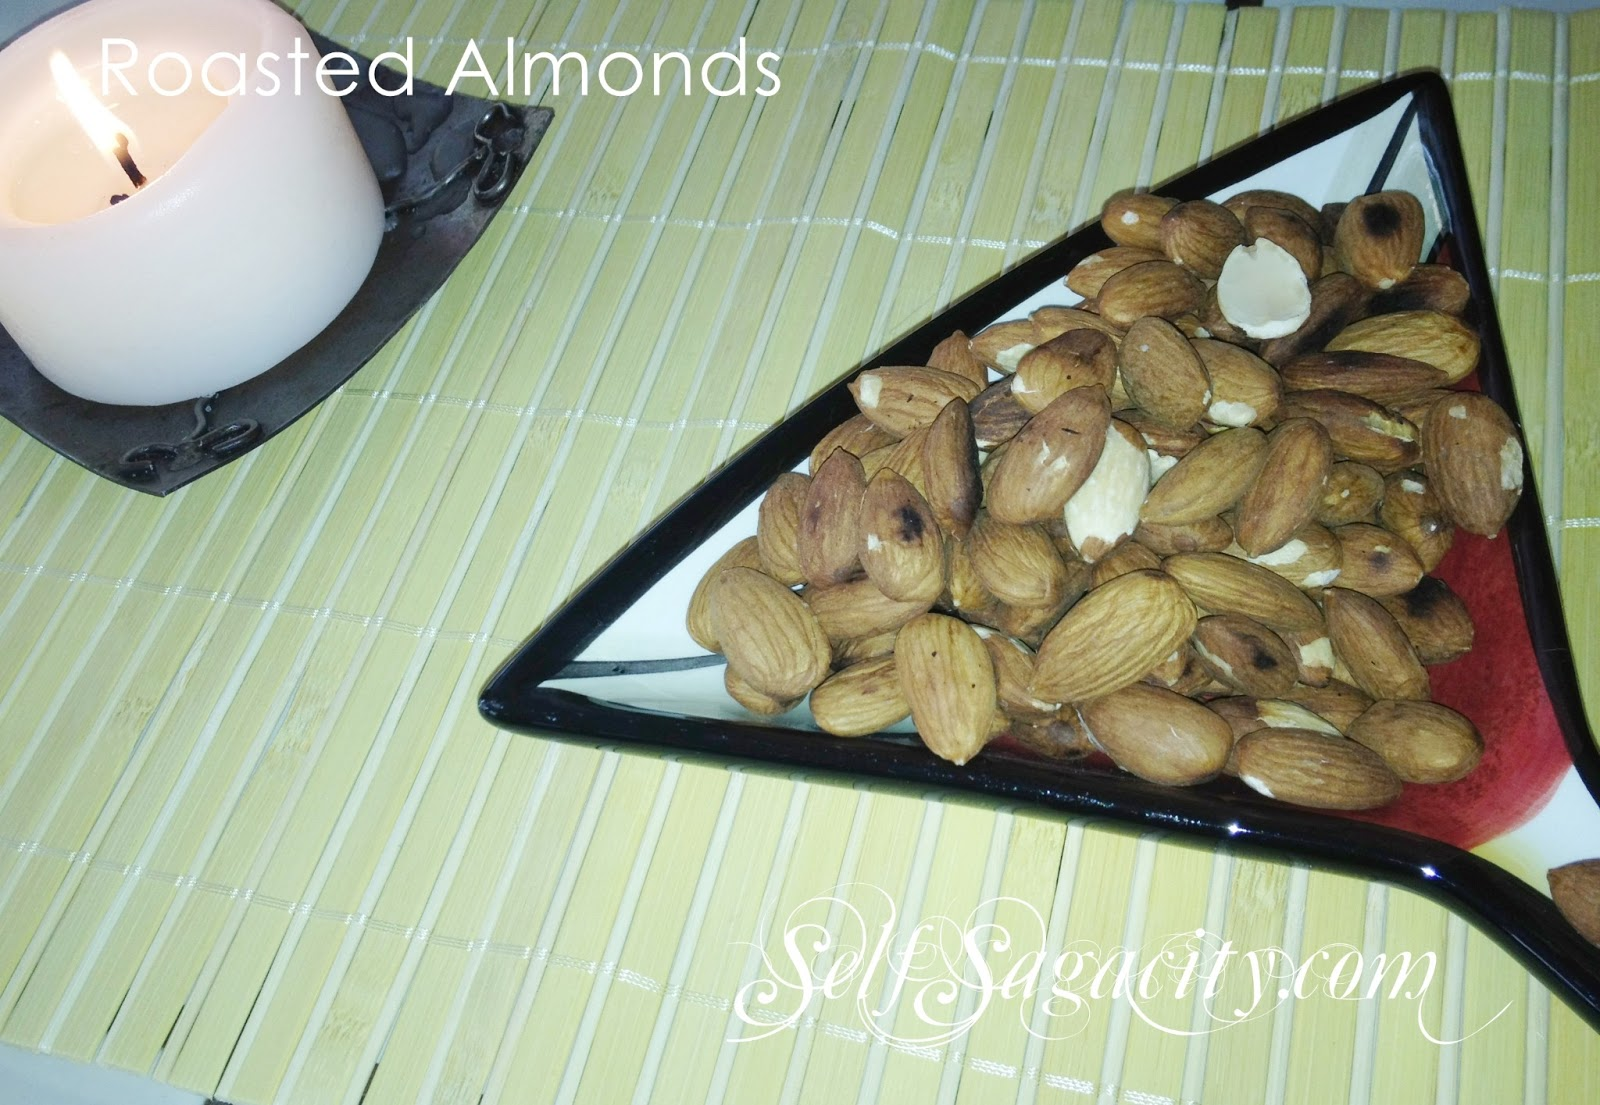 roasted almonds image